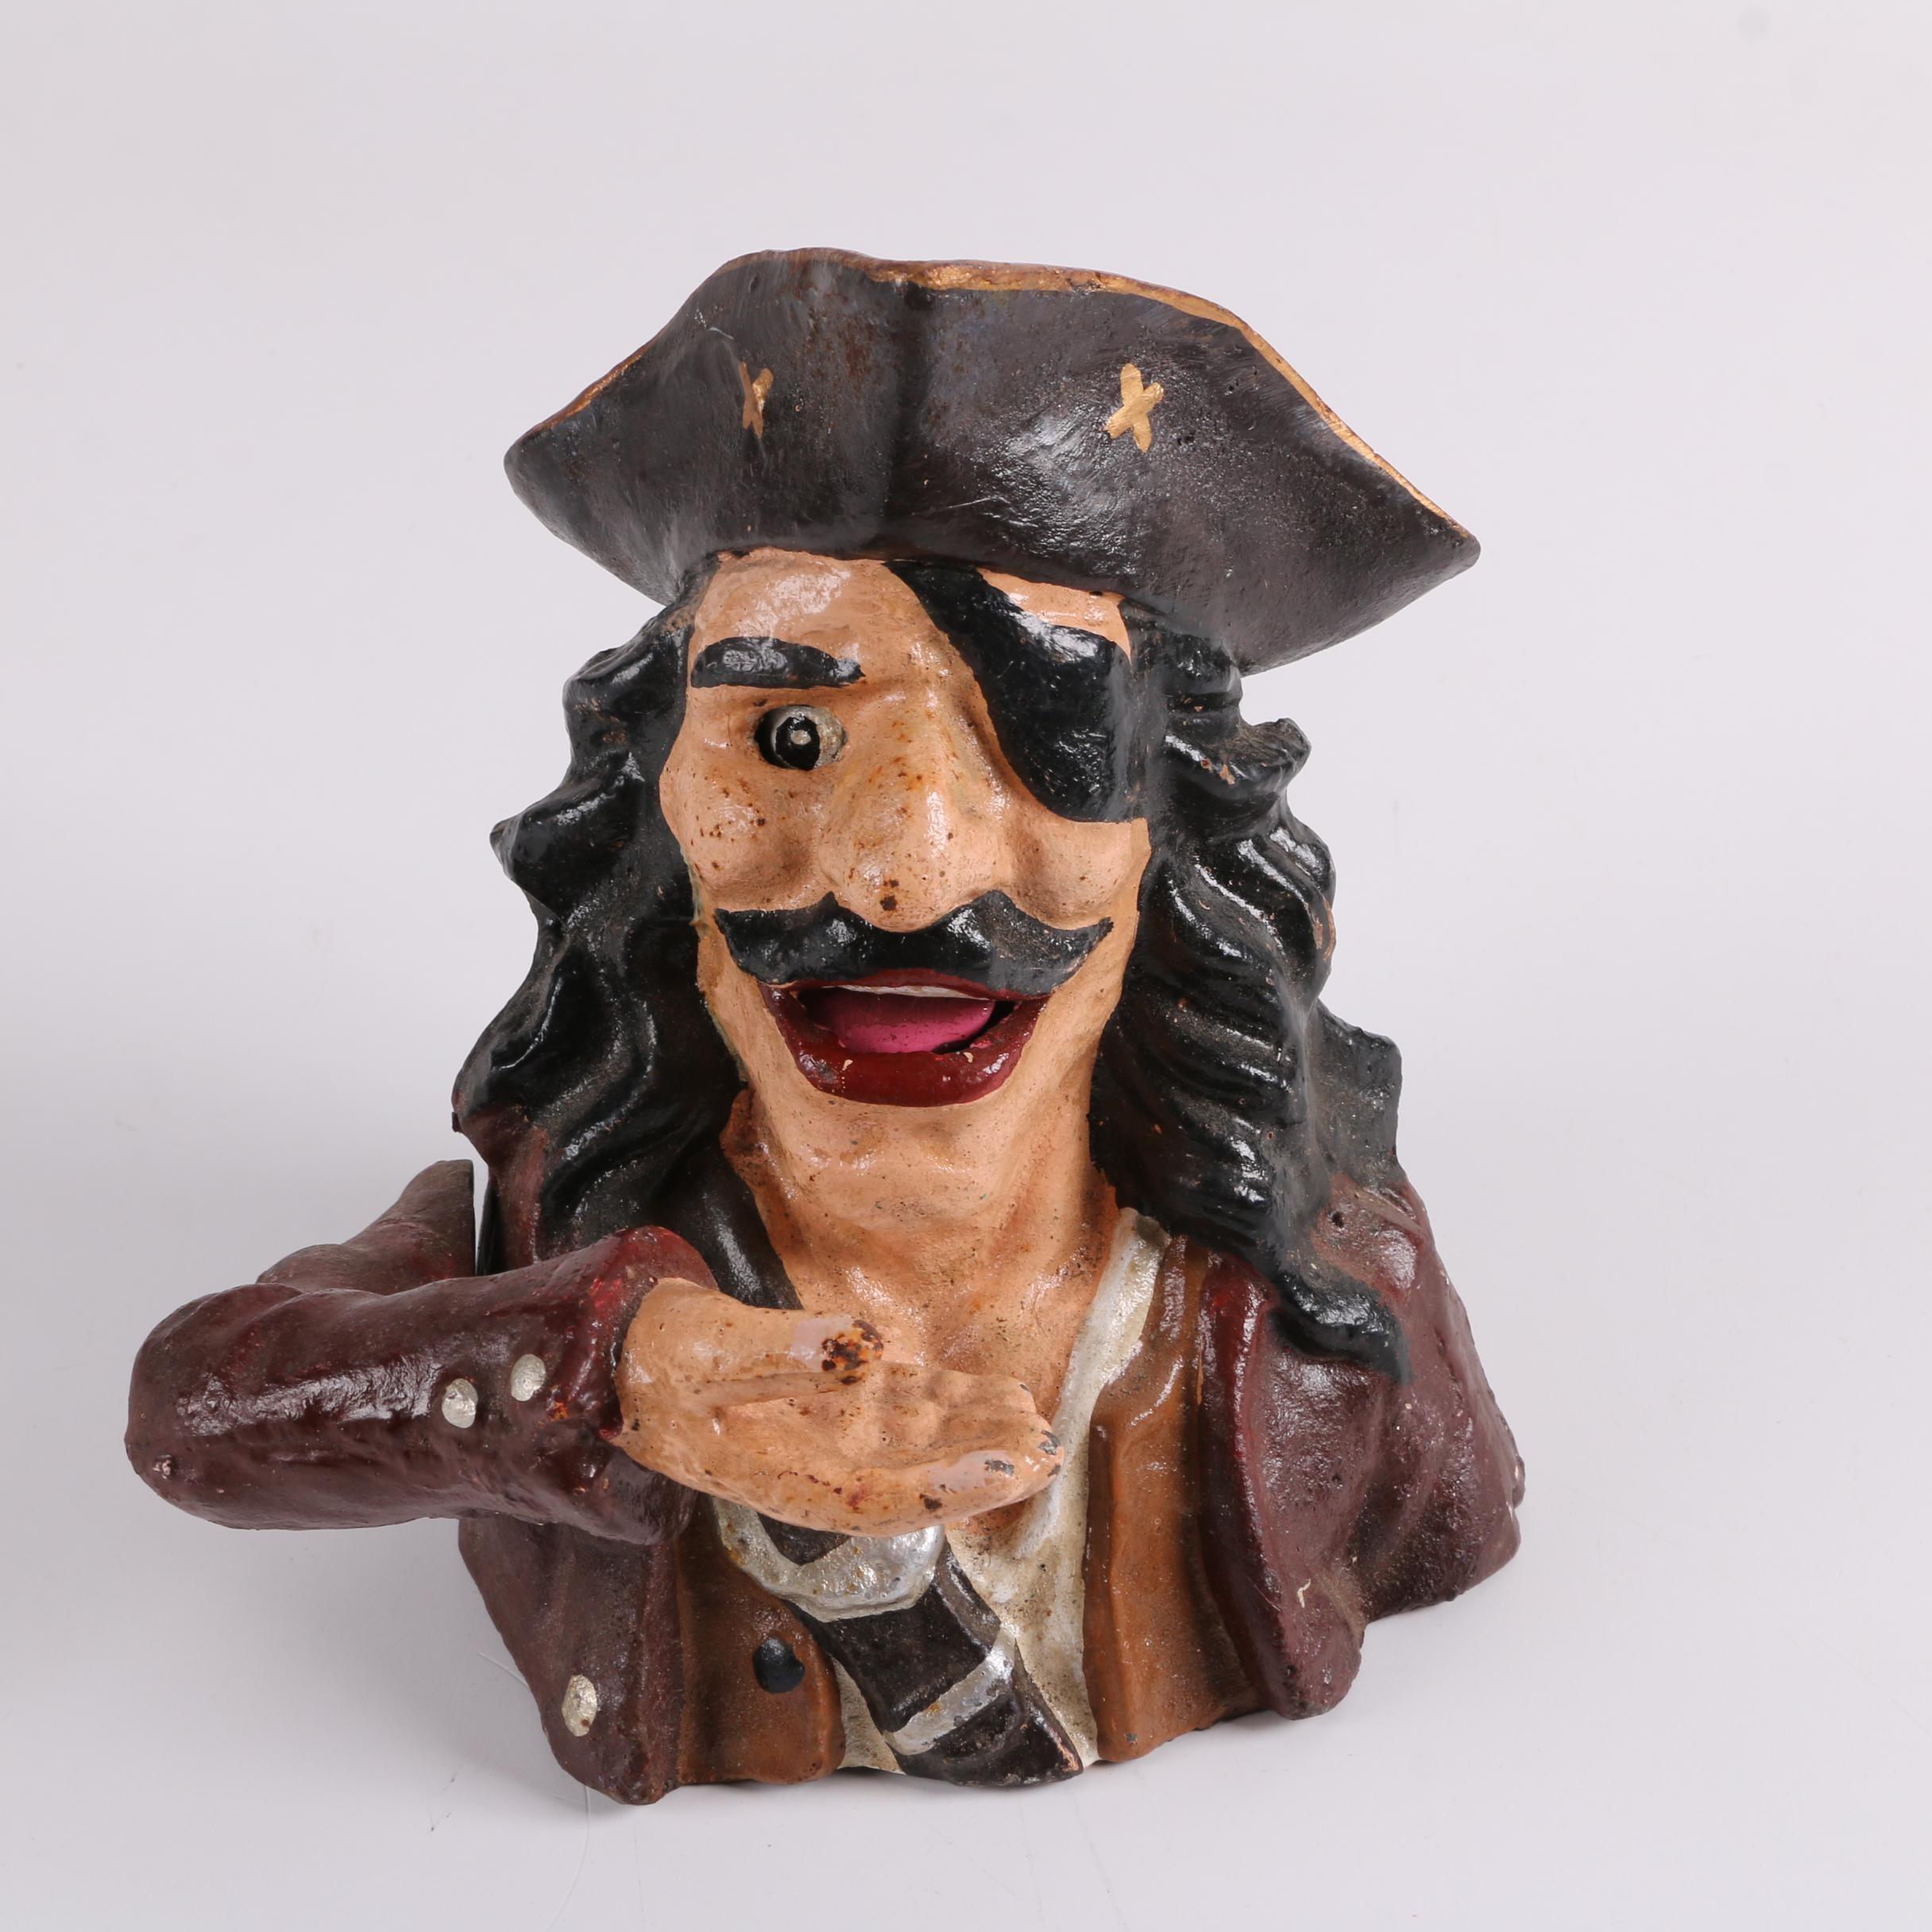 Cast Iron Mechanical Pirate Coin Bank